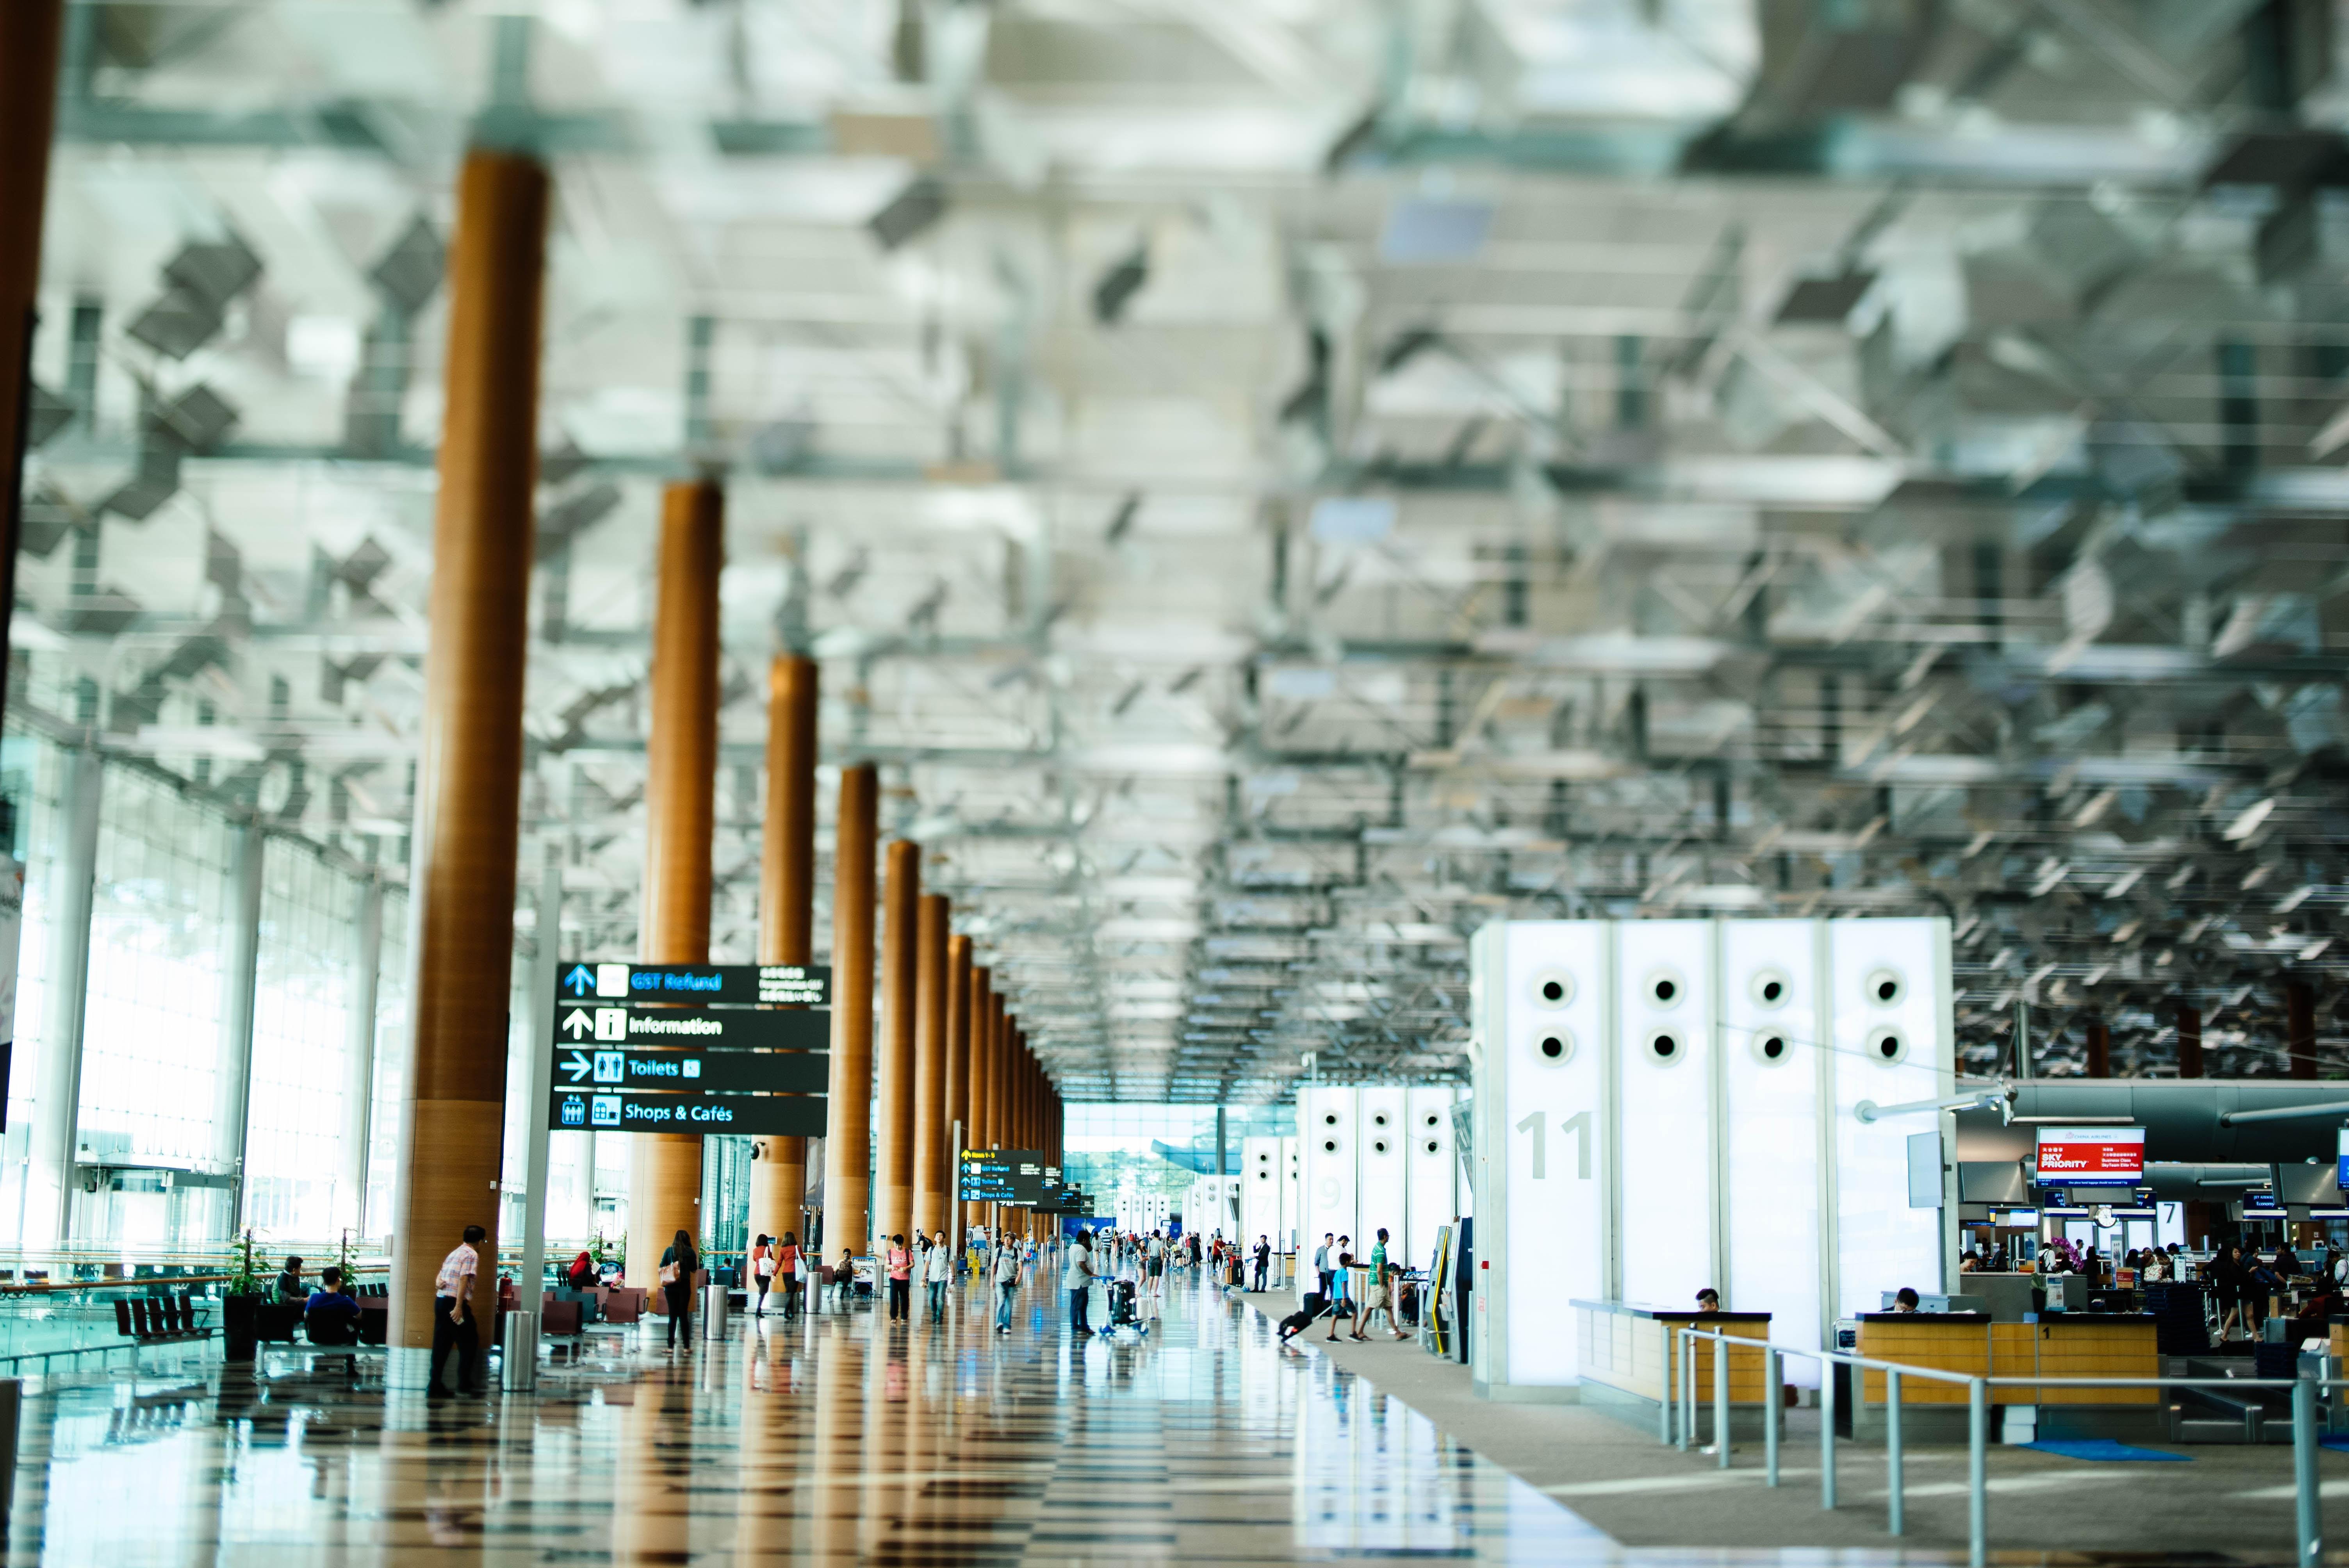 tilt photo of airport interior taken at daytime